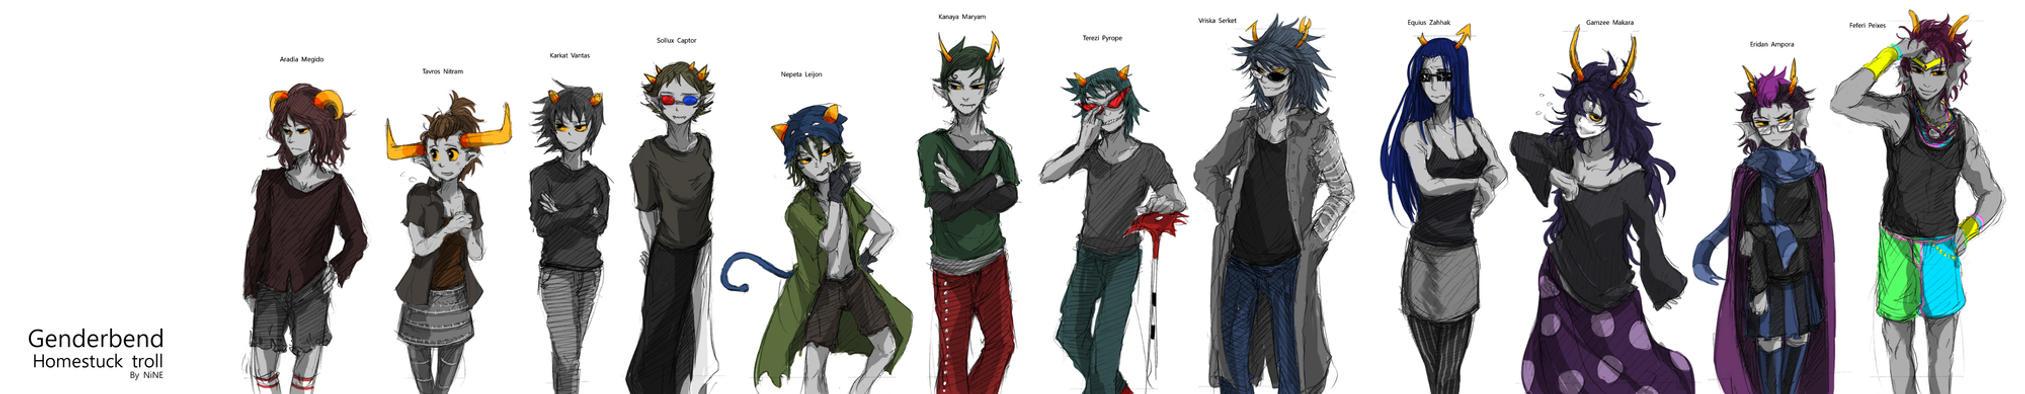 Genderbend troll by ninevsnine